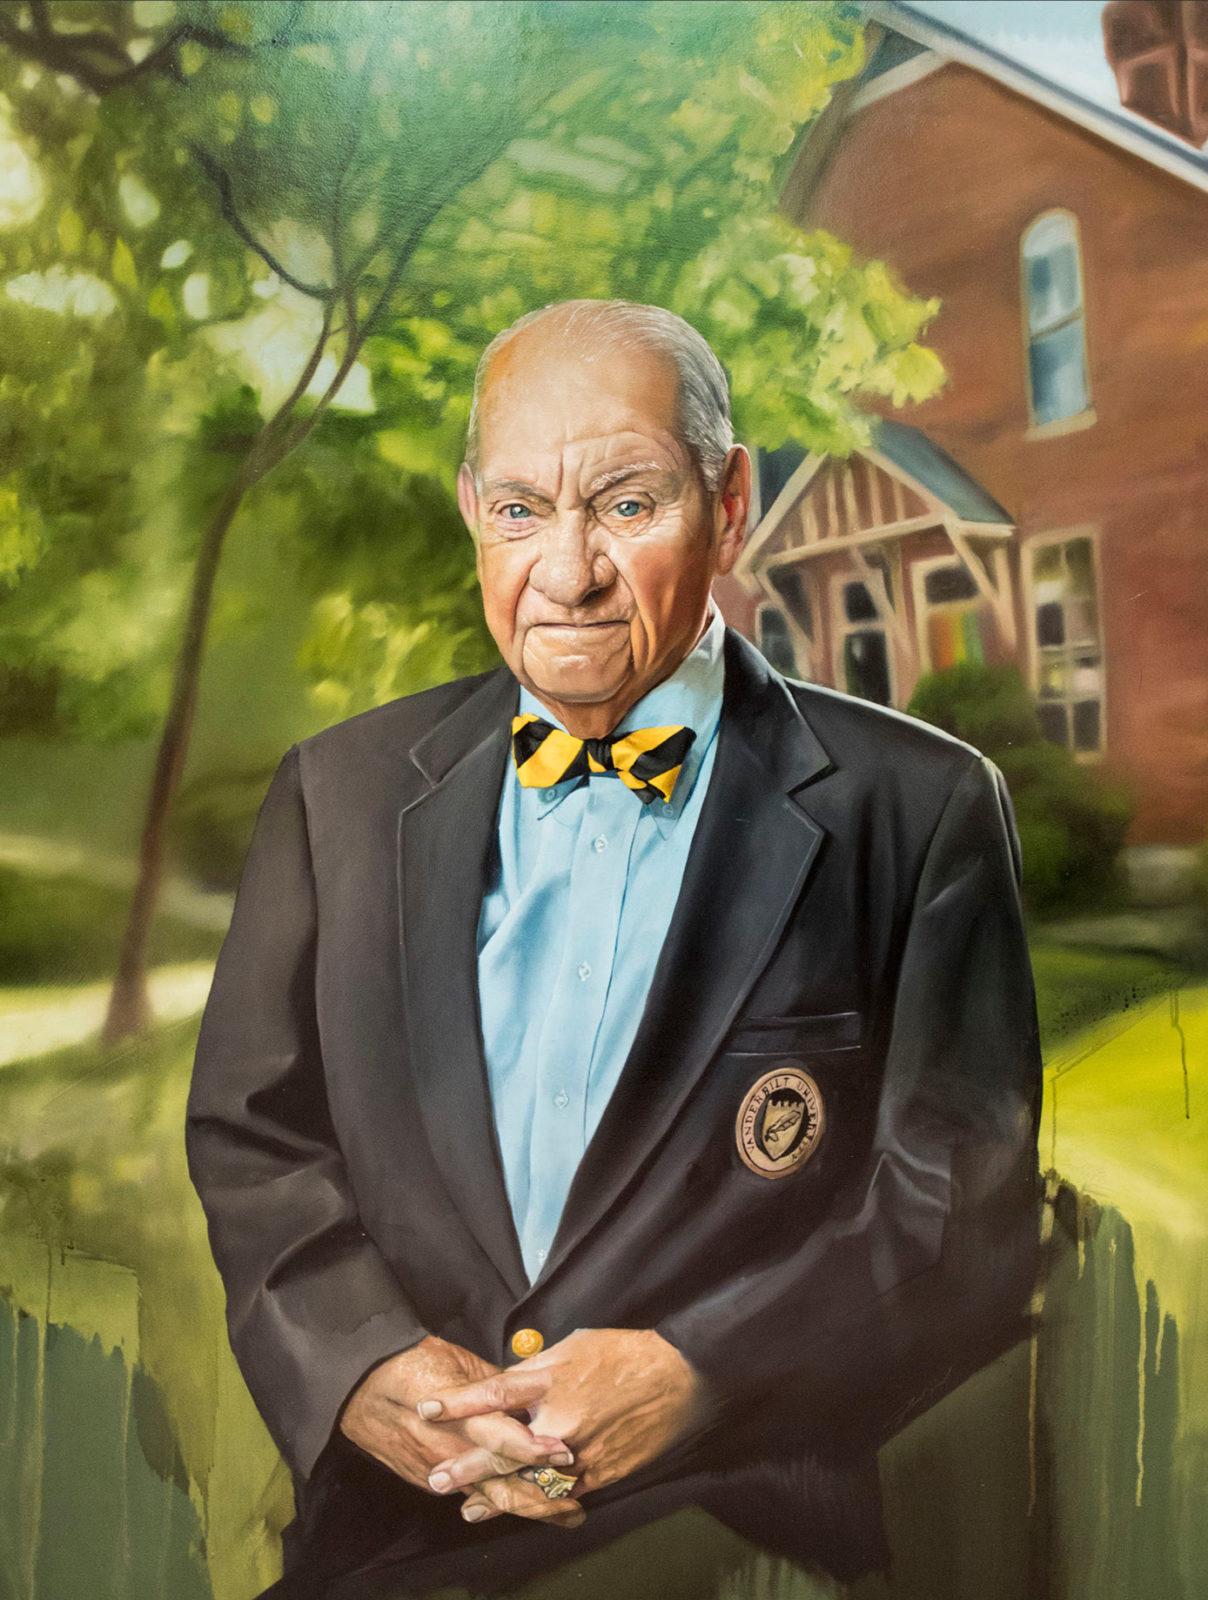 Vanderbilt Trailblazer portrait of K.C. Potter (painted by Jared Small)